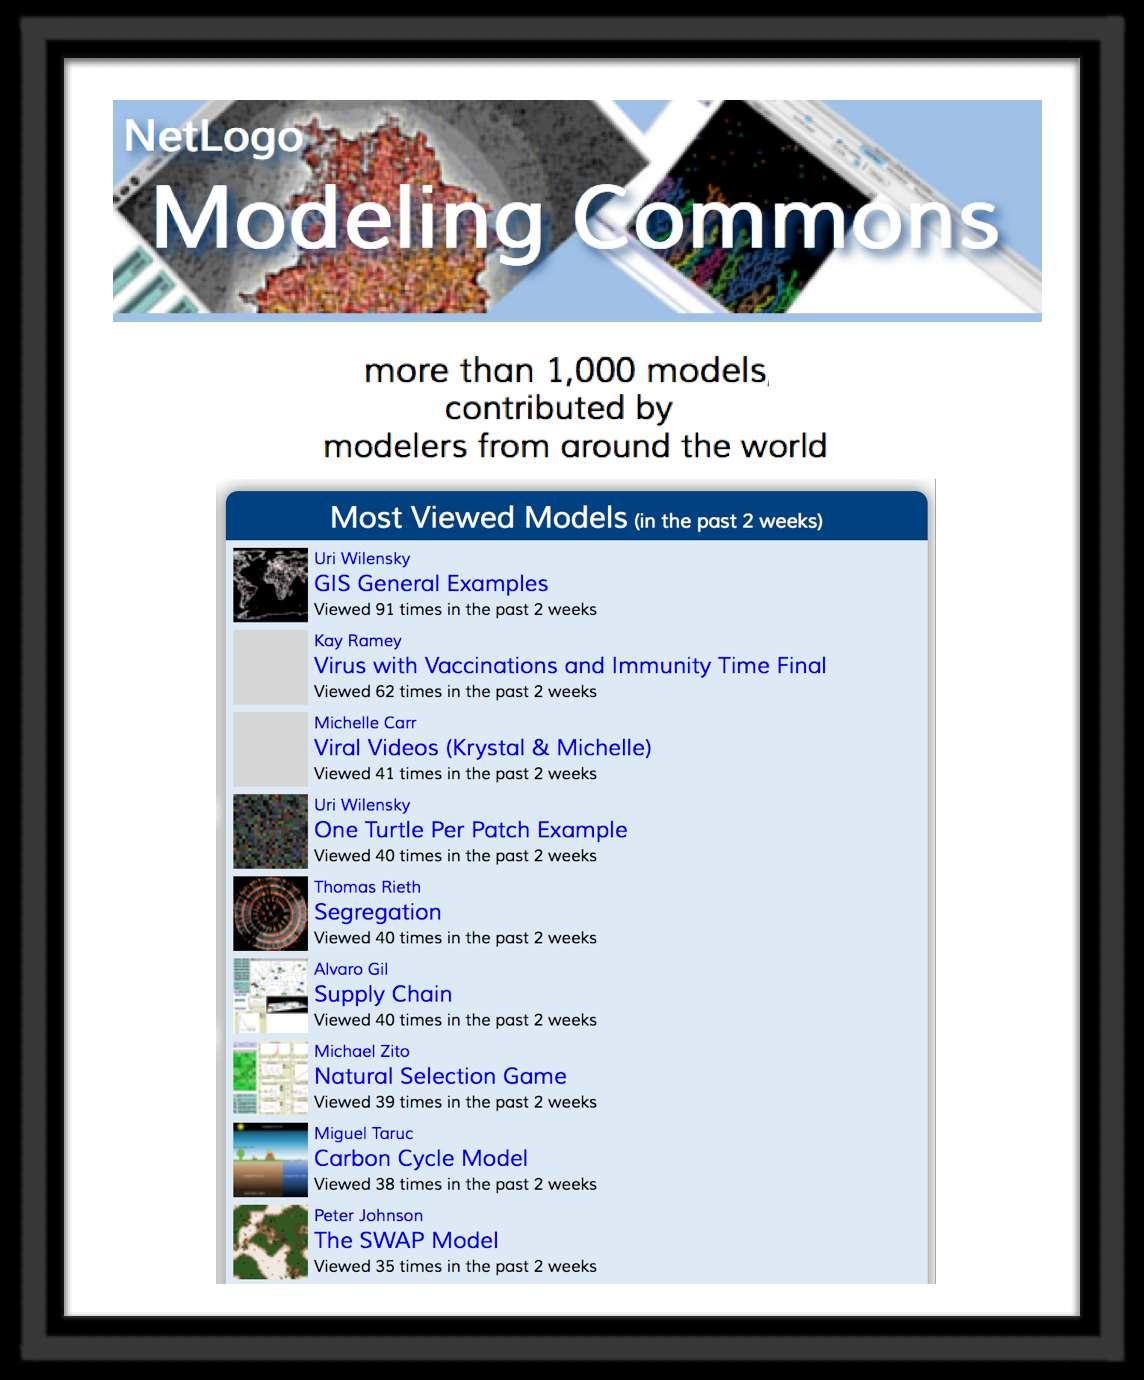 modelingcommons